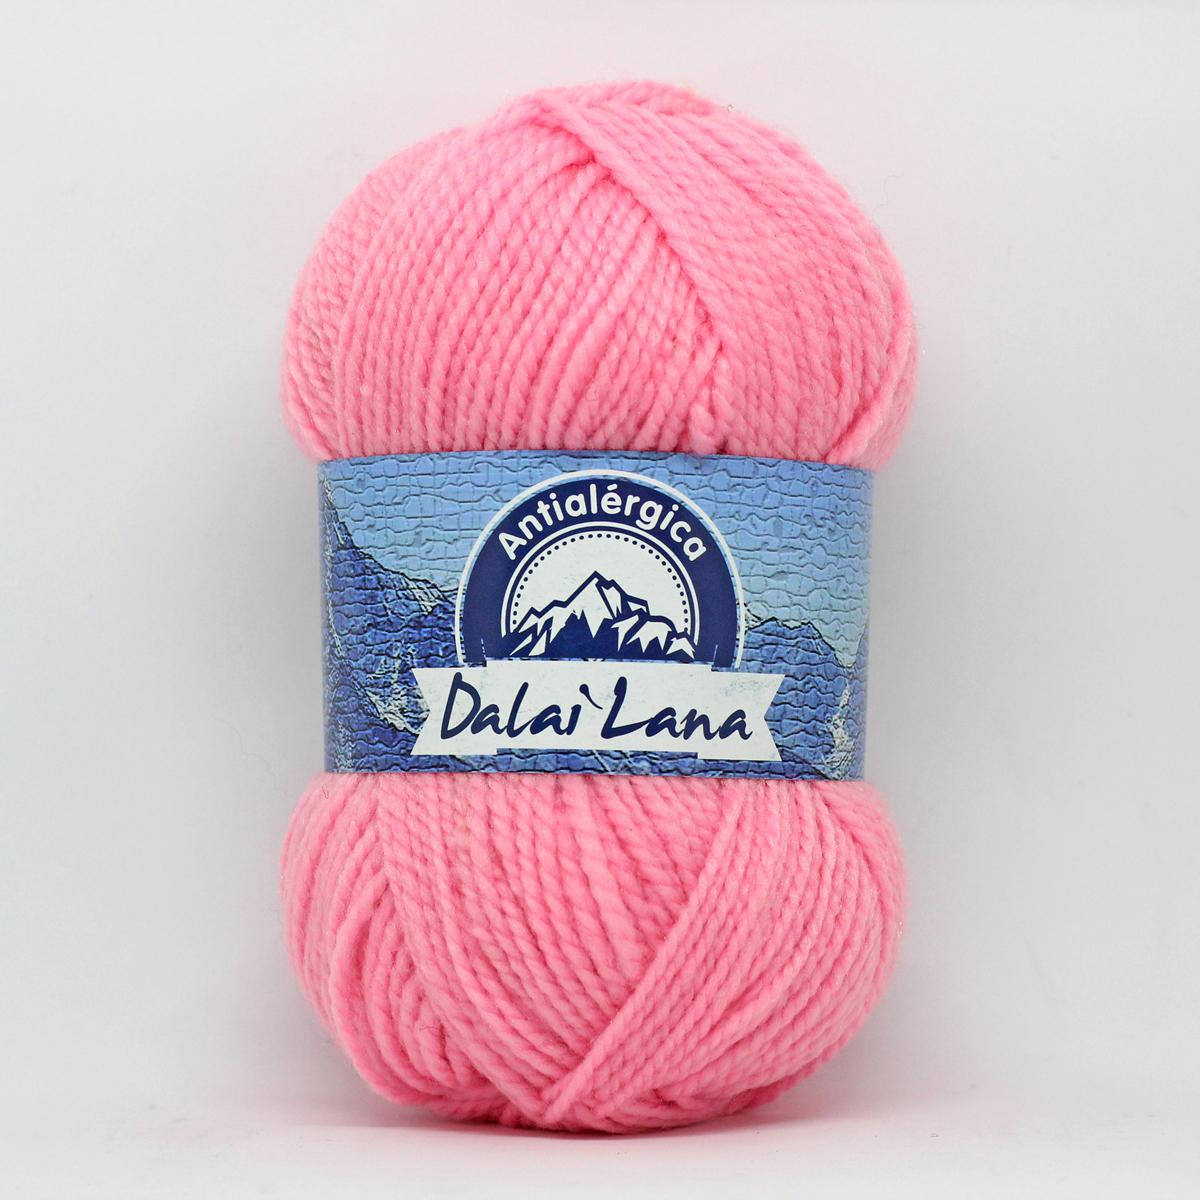 Dalai Lana - 757